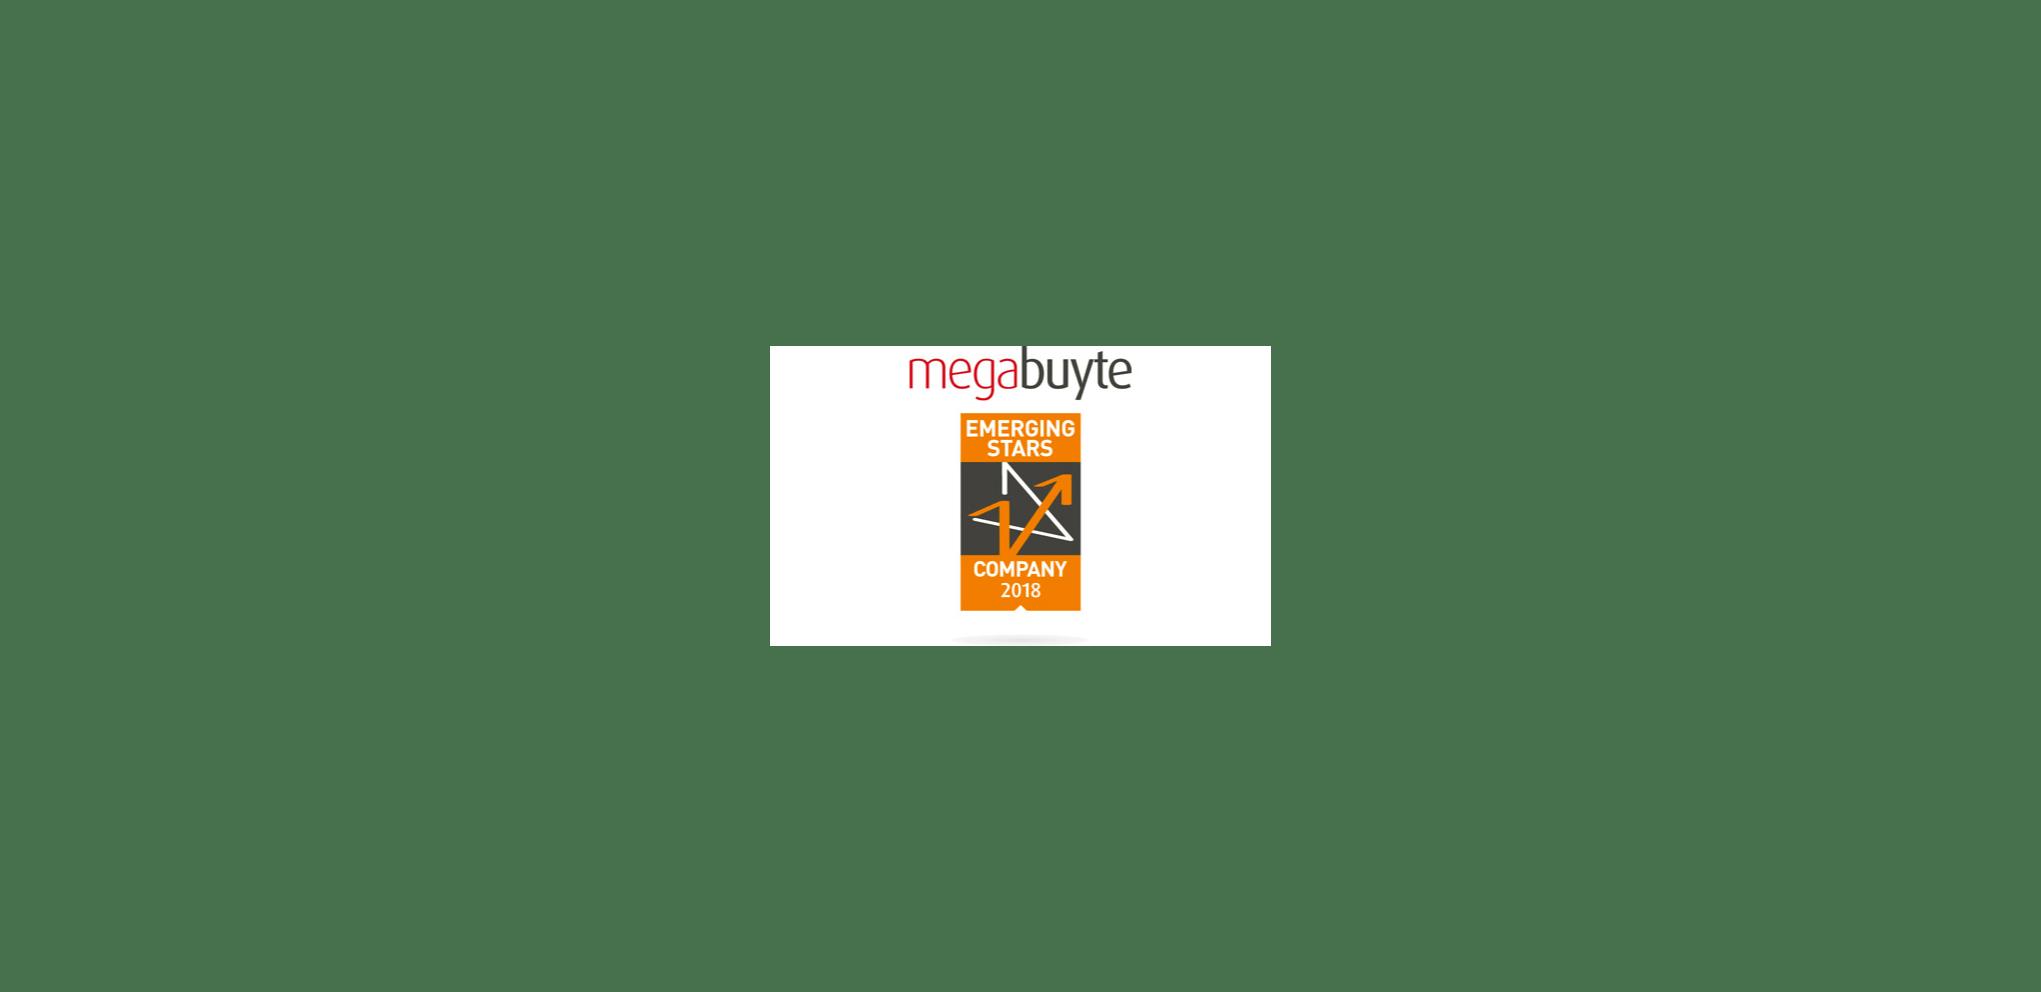 Megabuyte Logo 2018